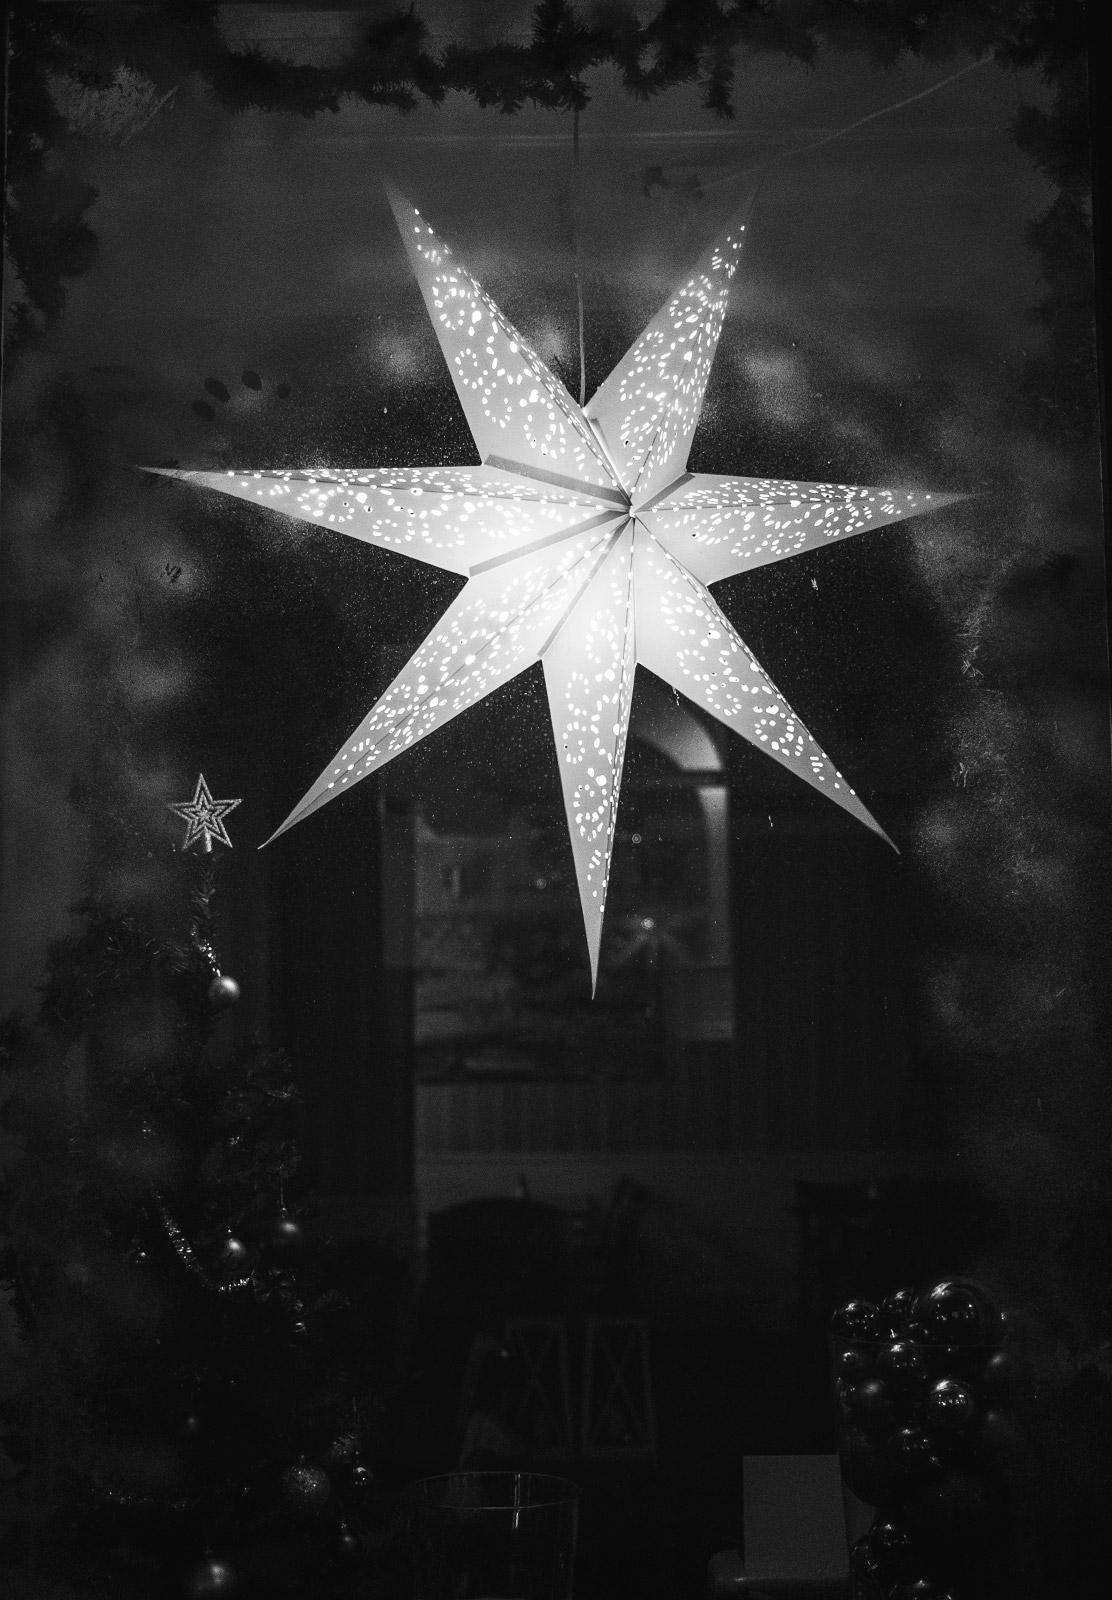 Star hanging in window